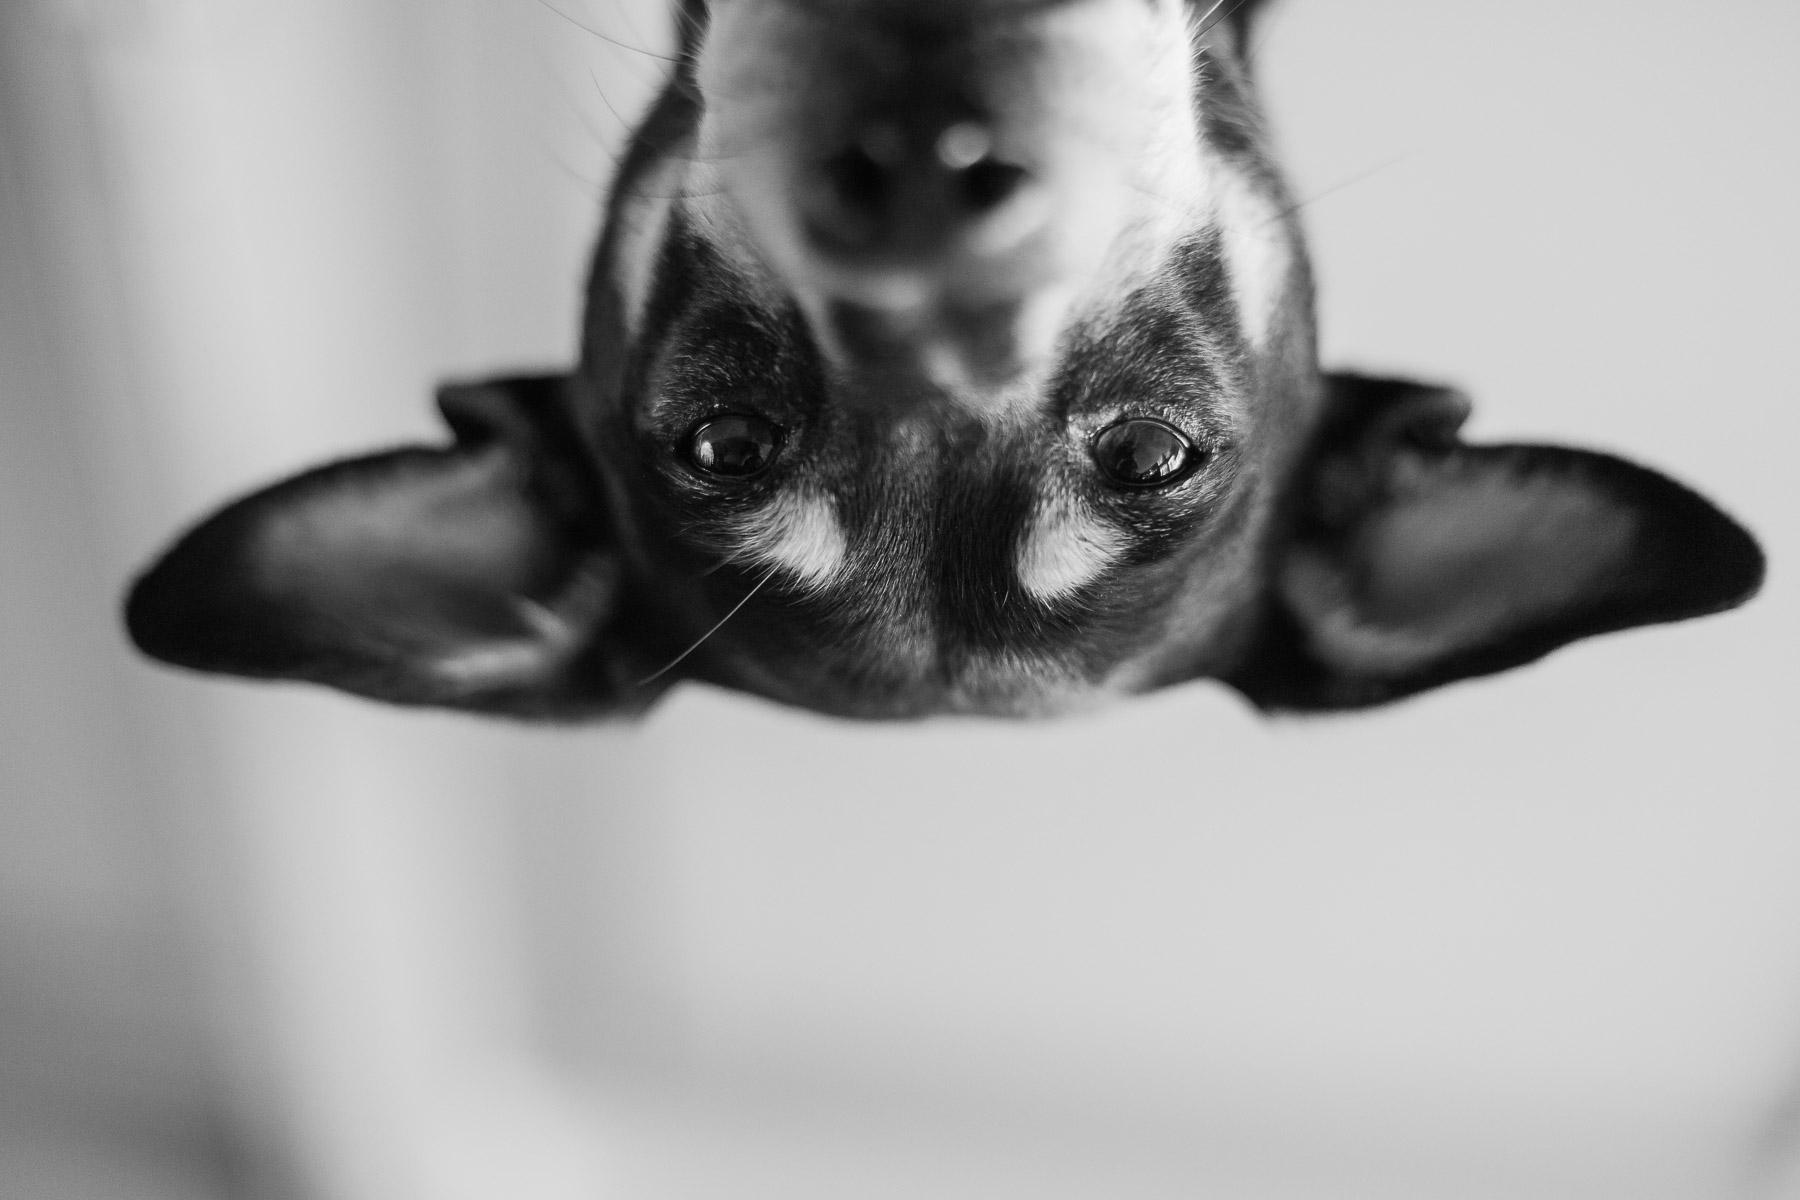 black-and-white-artistic-dog-photo